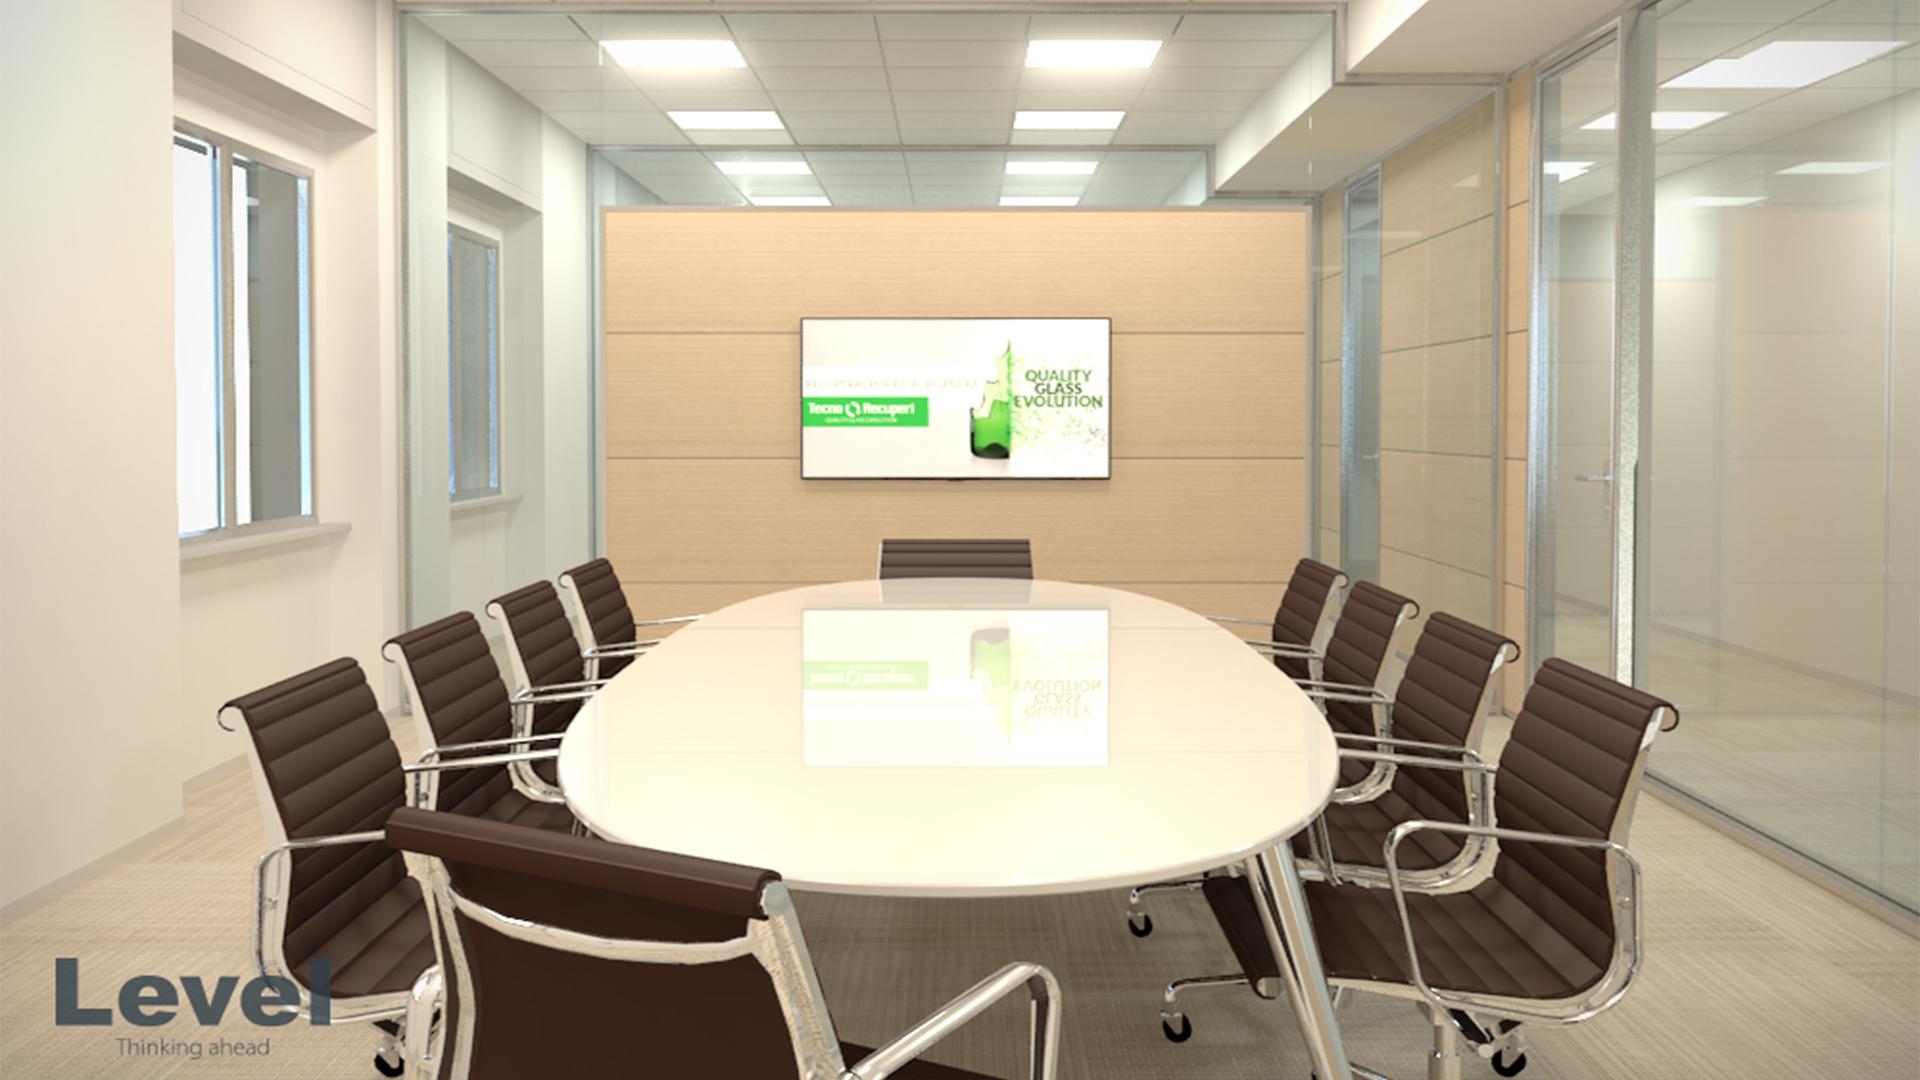 tecno-recuperi-gerenzano-level-office-landscape-2